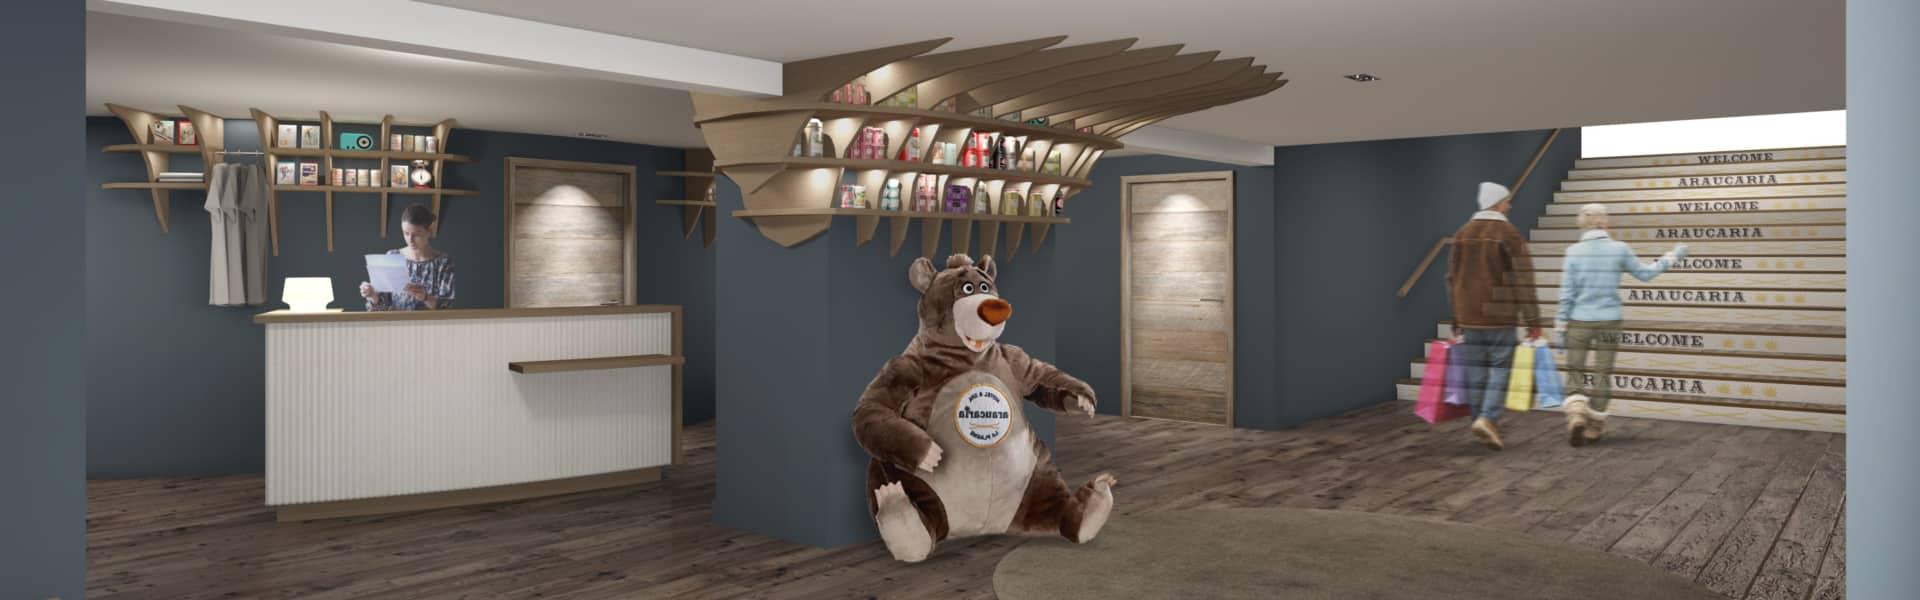 HOTEL-ARAUCARIA-RECEPTION